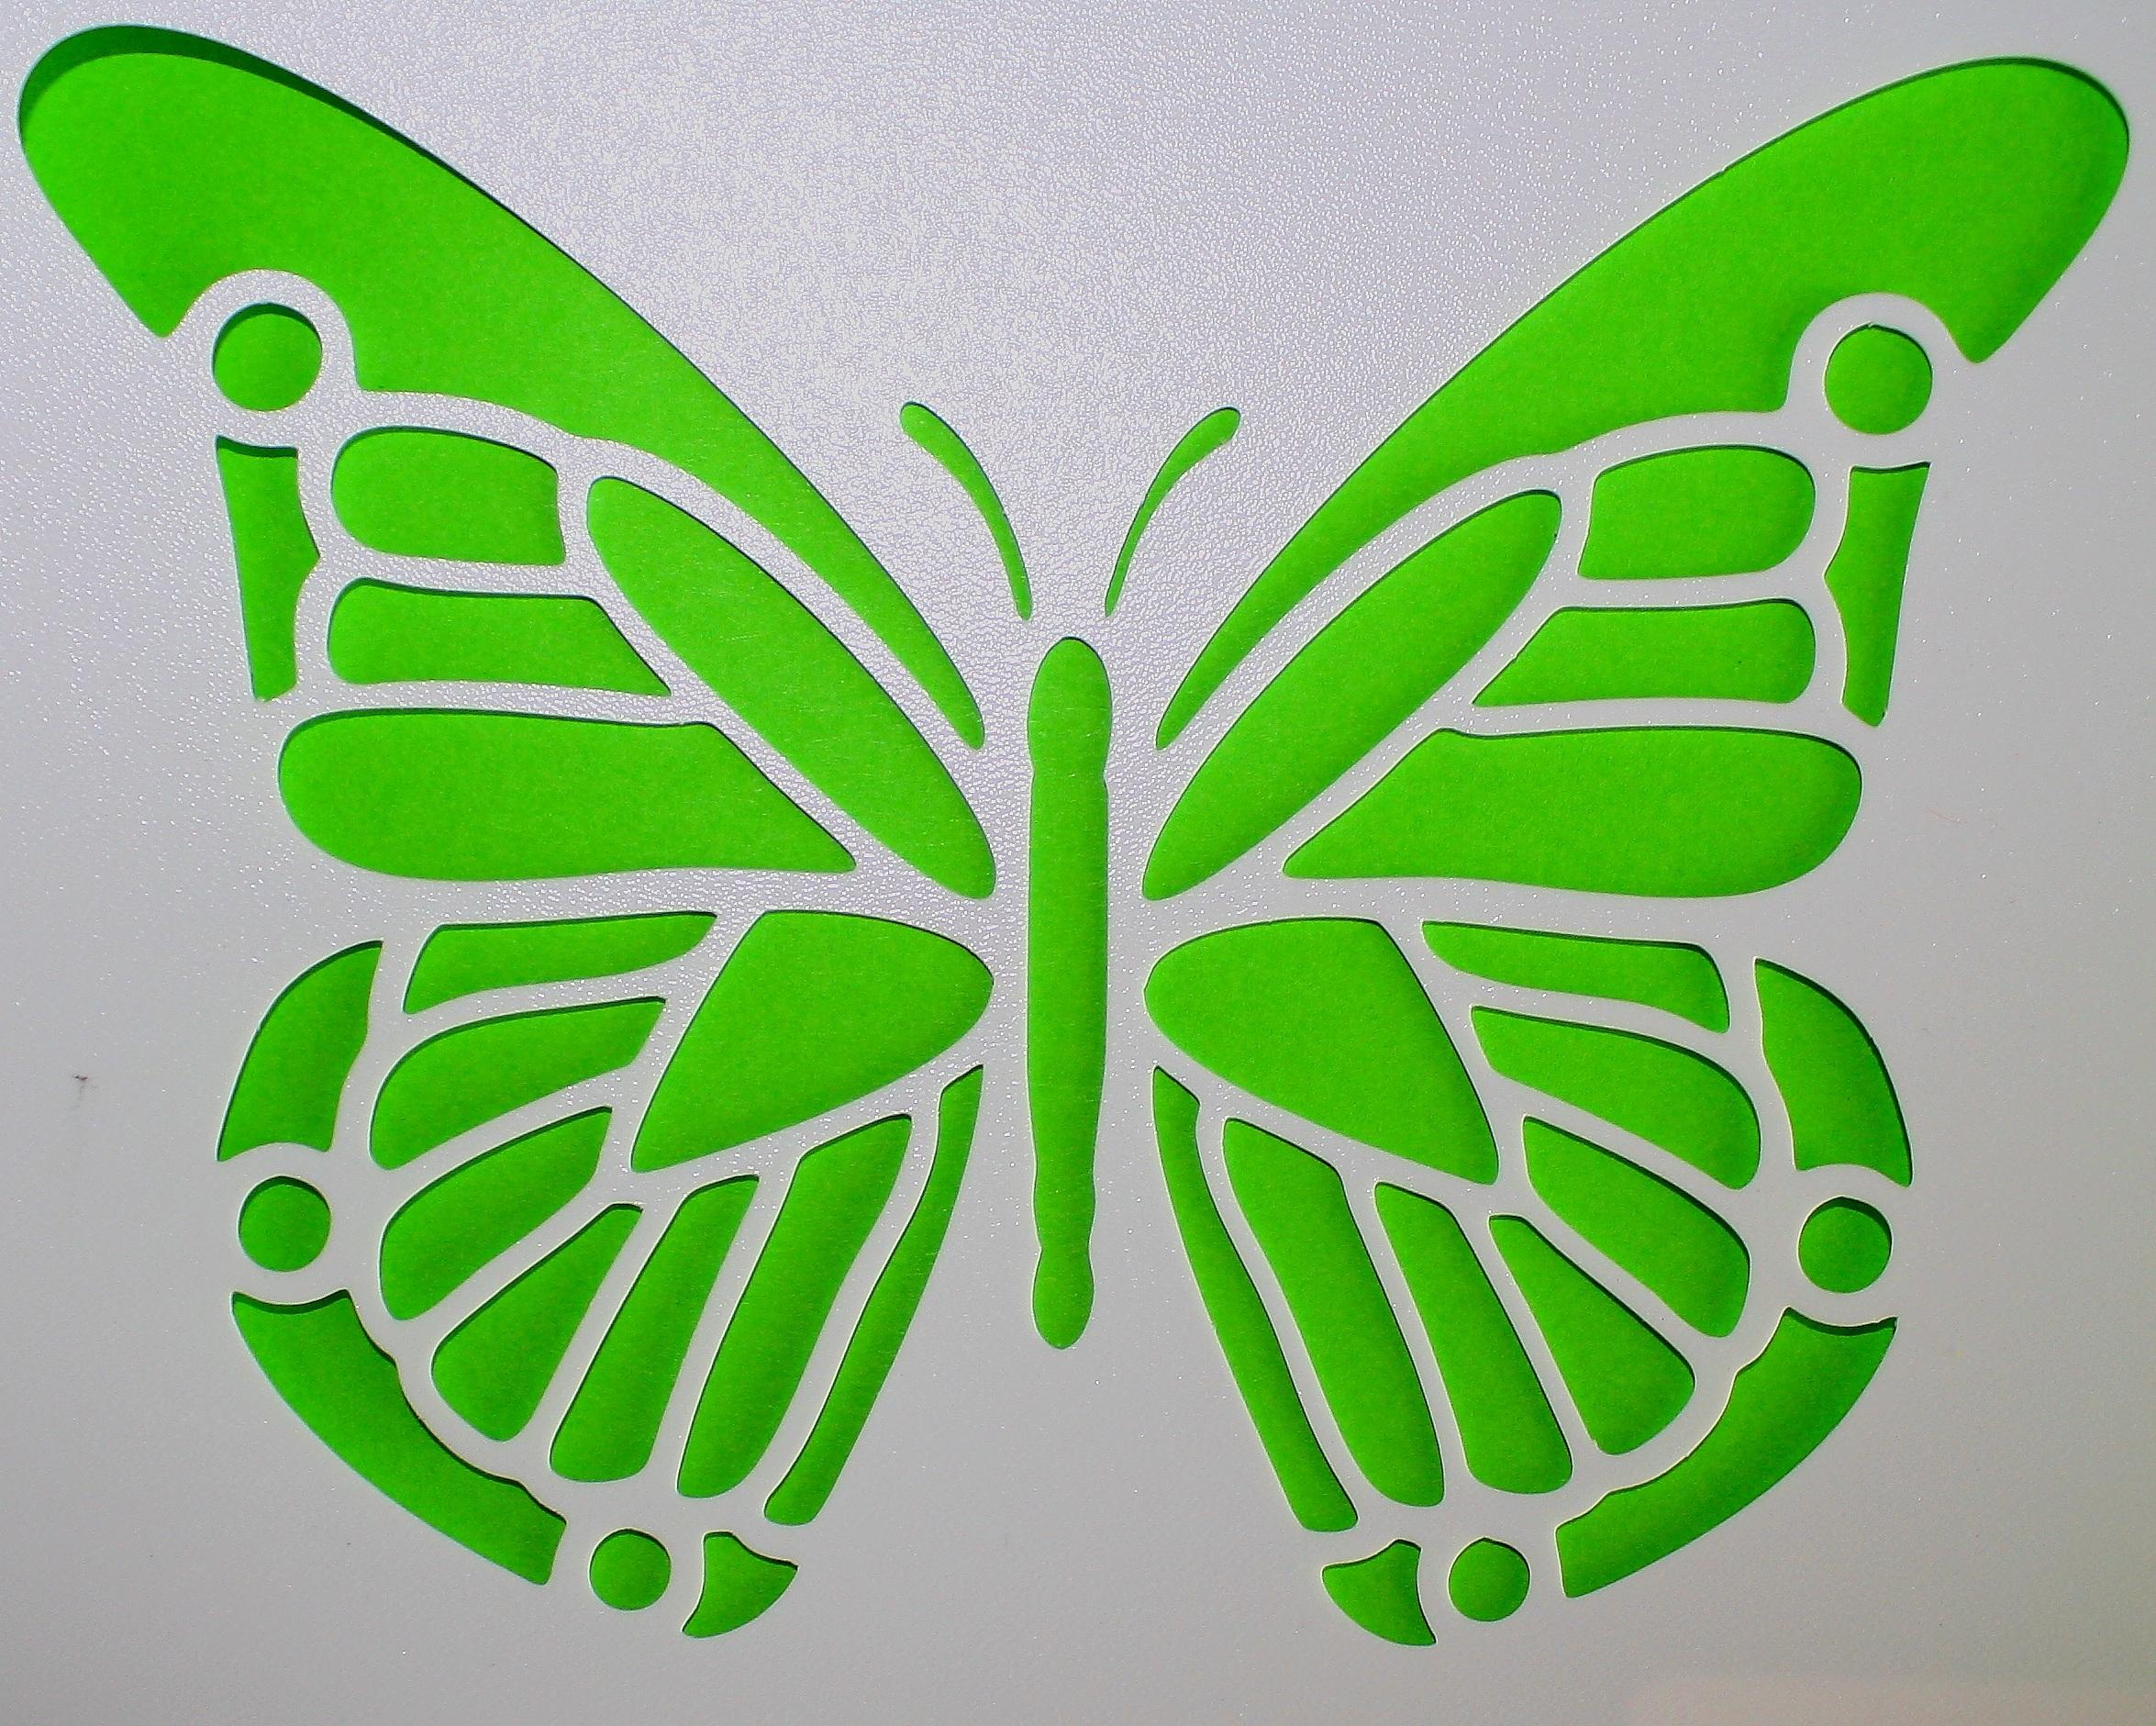 Kostenlose foto : Flügel, Grün, Insekt, Schmetterling, wirbellos ...